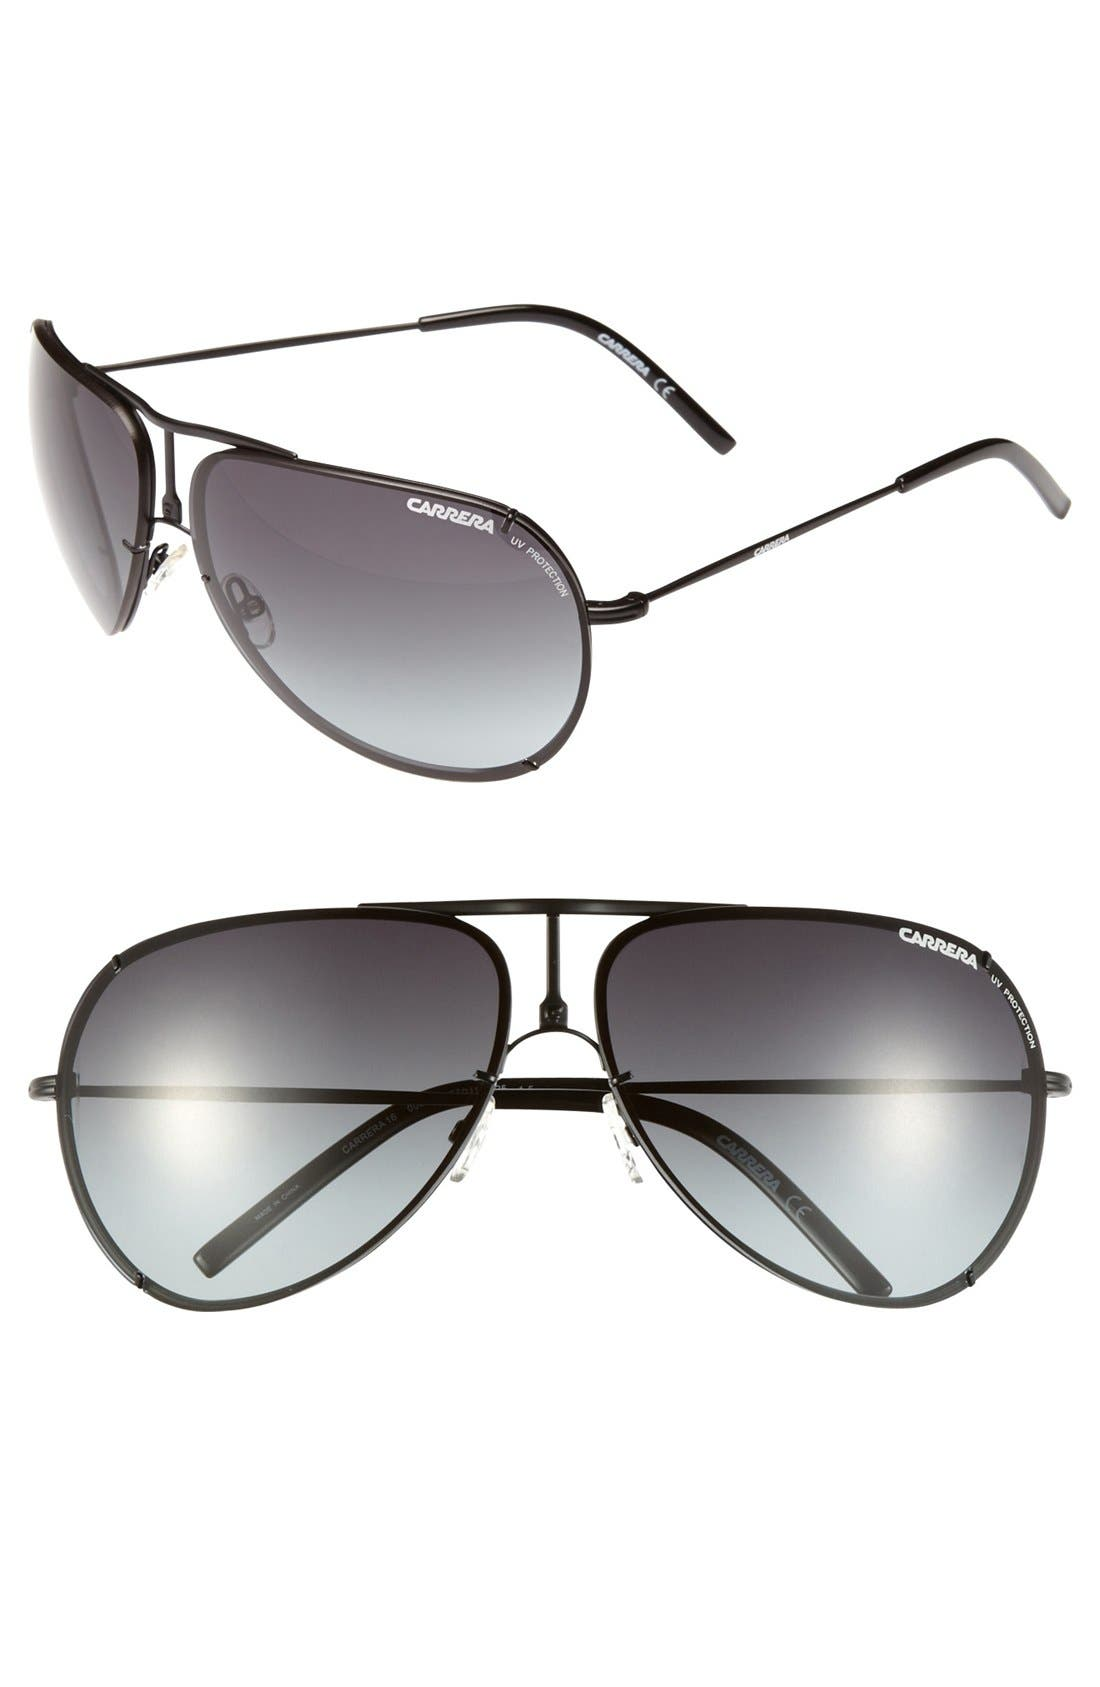 Main Image - Carrera Eyewear 67mm Metal Aviator Sunglasses